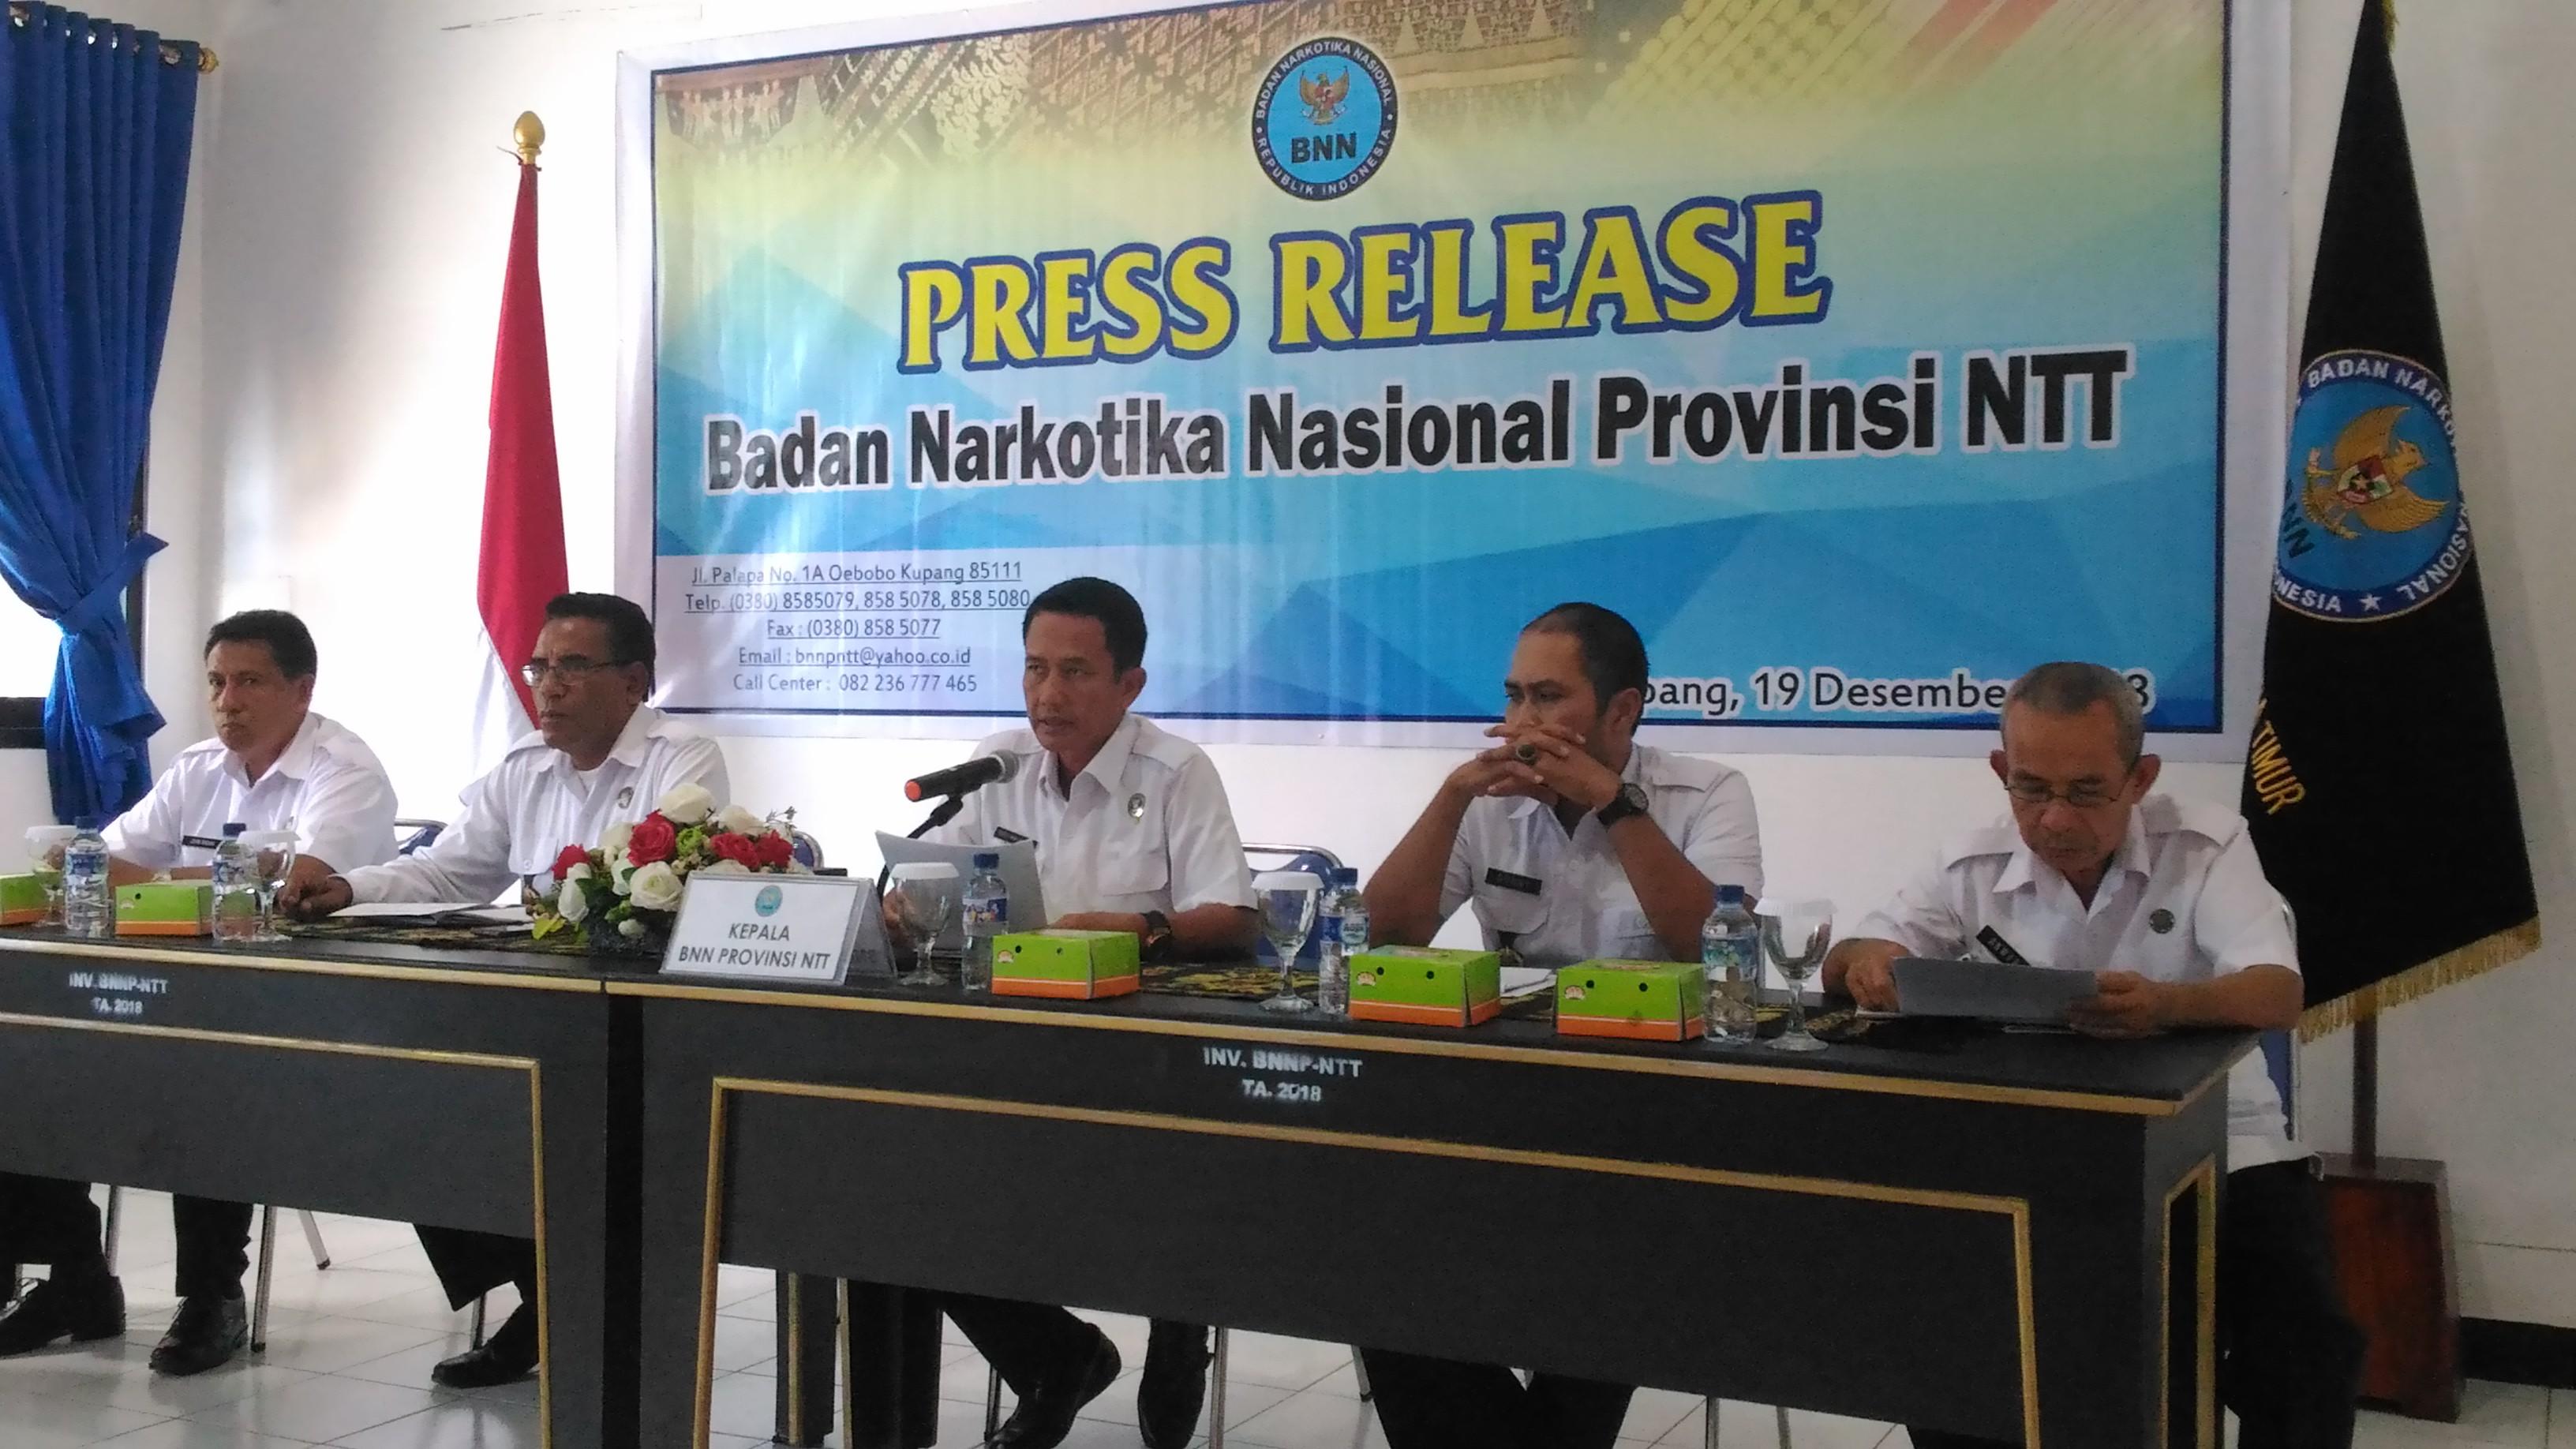 Tahun 2018, BNN NTT  Ungkap Tujuh Kasus Peredaran Gelap Narkotika